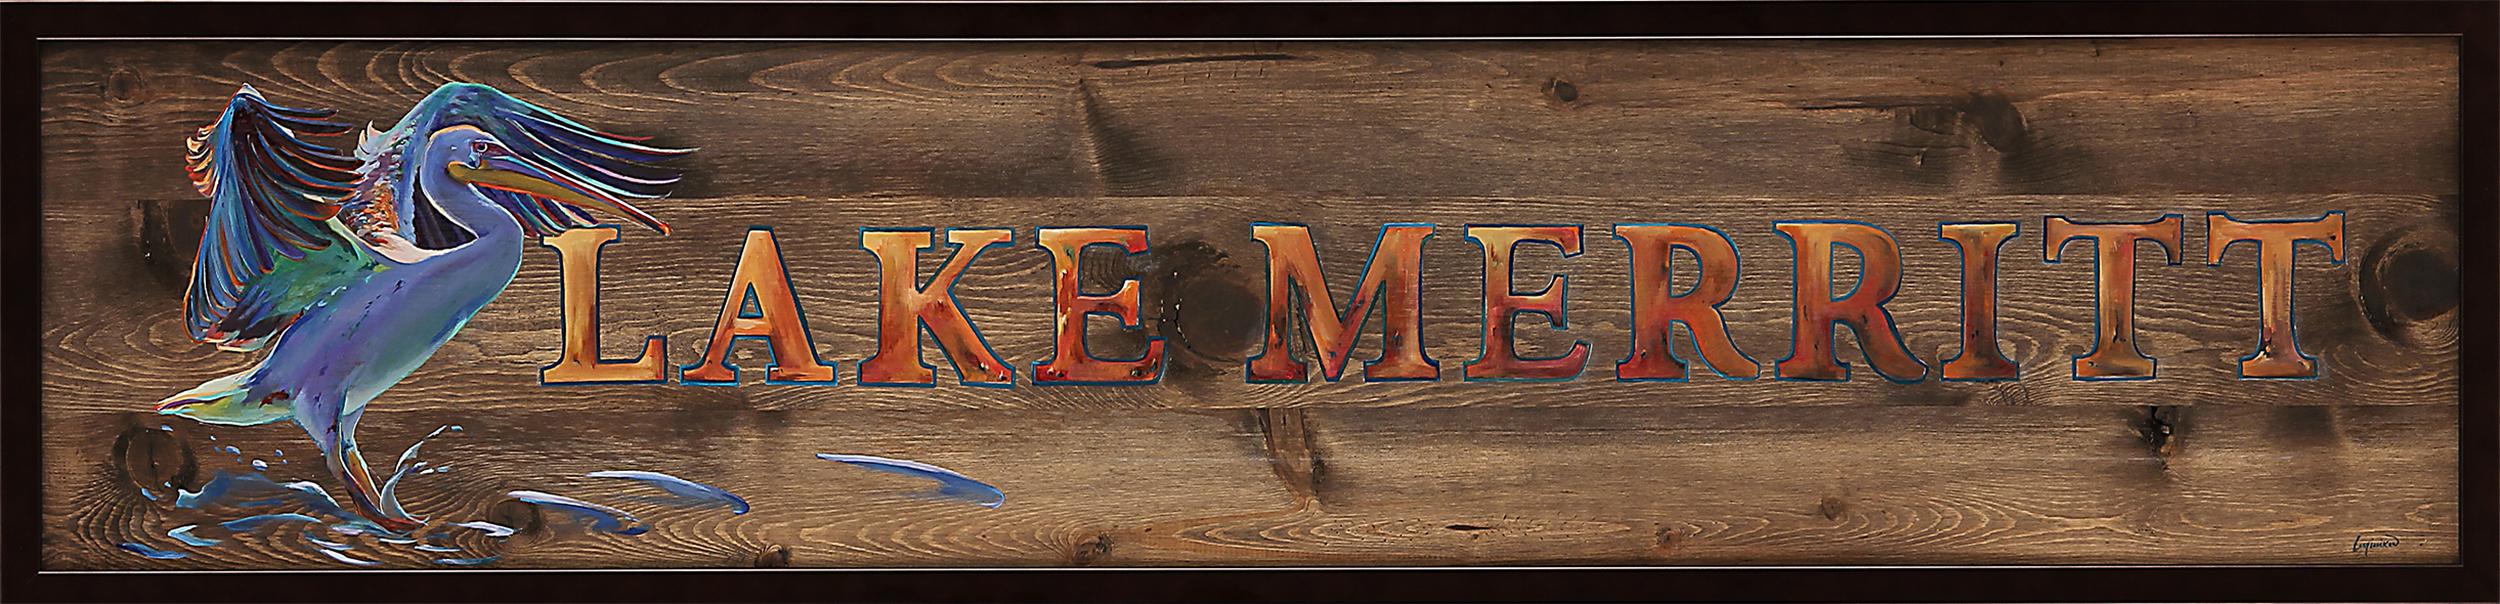 lakemerrit_2500web.jpg